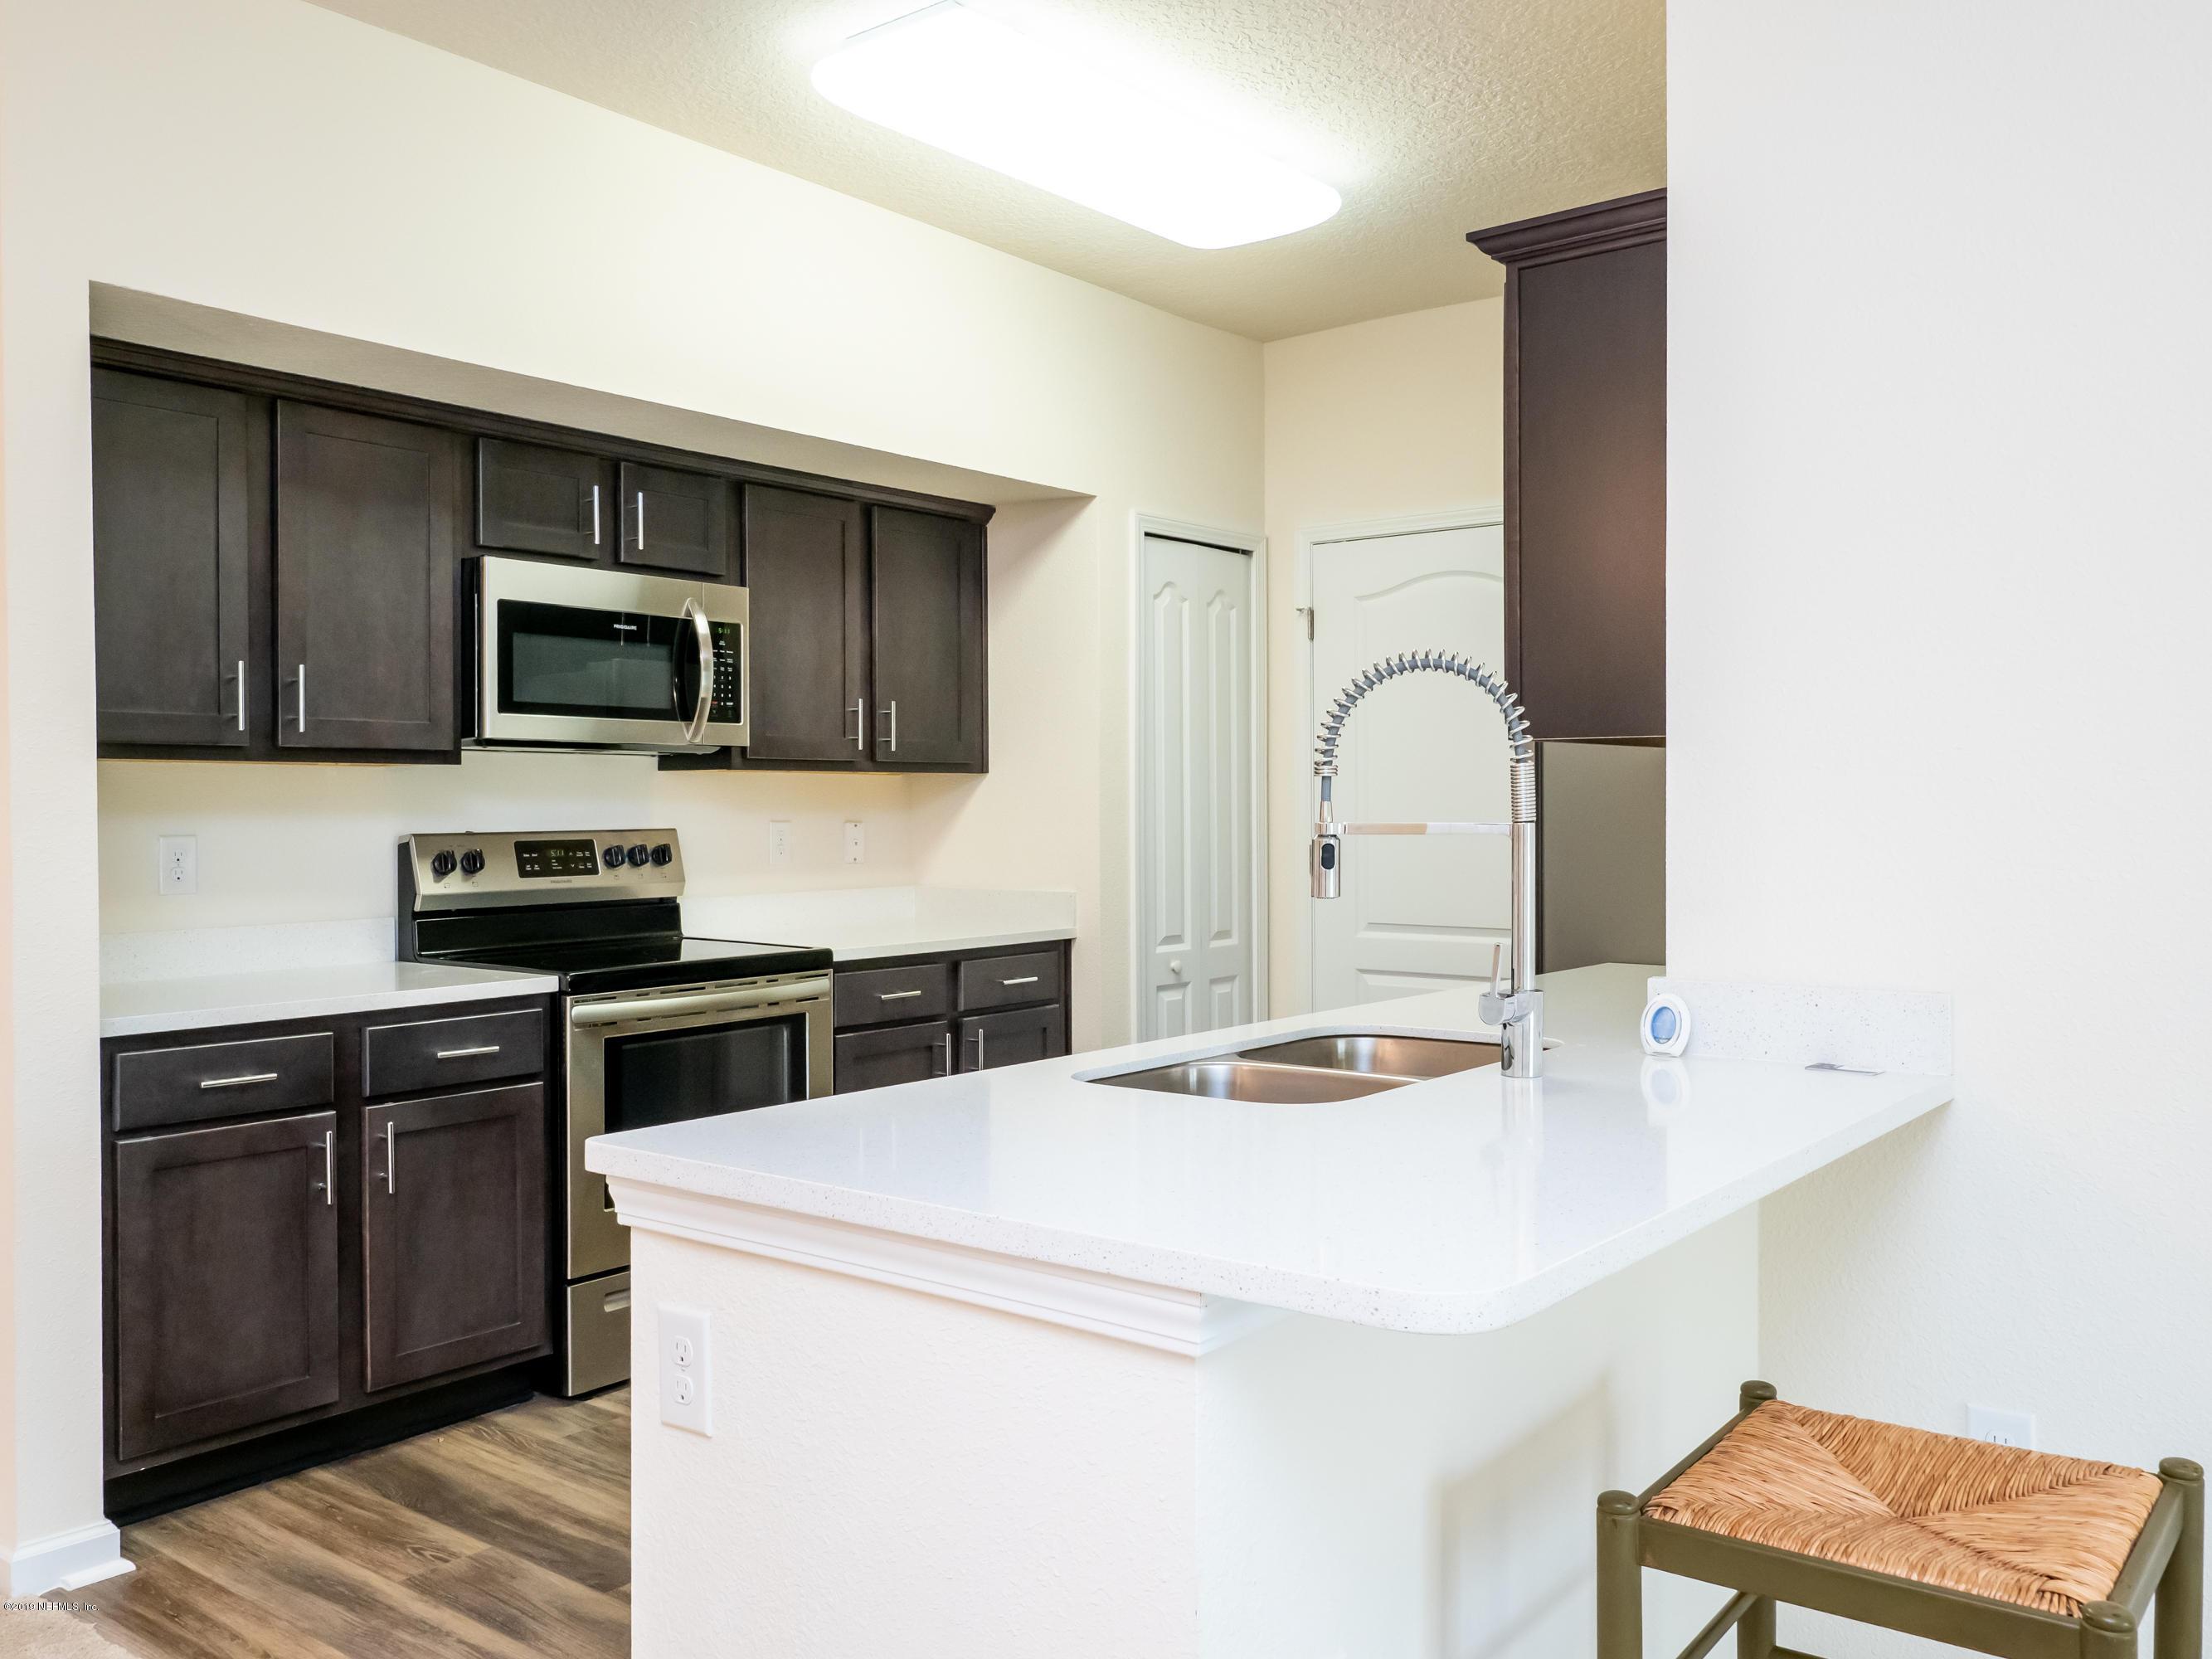 4932 KEY LIME, JACKSONVILLE, FLORIDA 32256, 2 Bedrooms Bedrooms, ,2 BathroomsBathrooms,Condo,For sale,KEY LIME,1022427